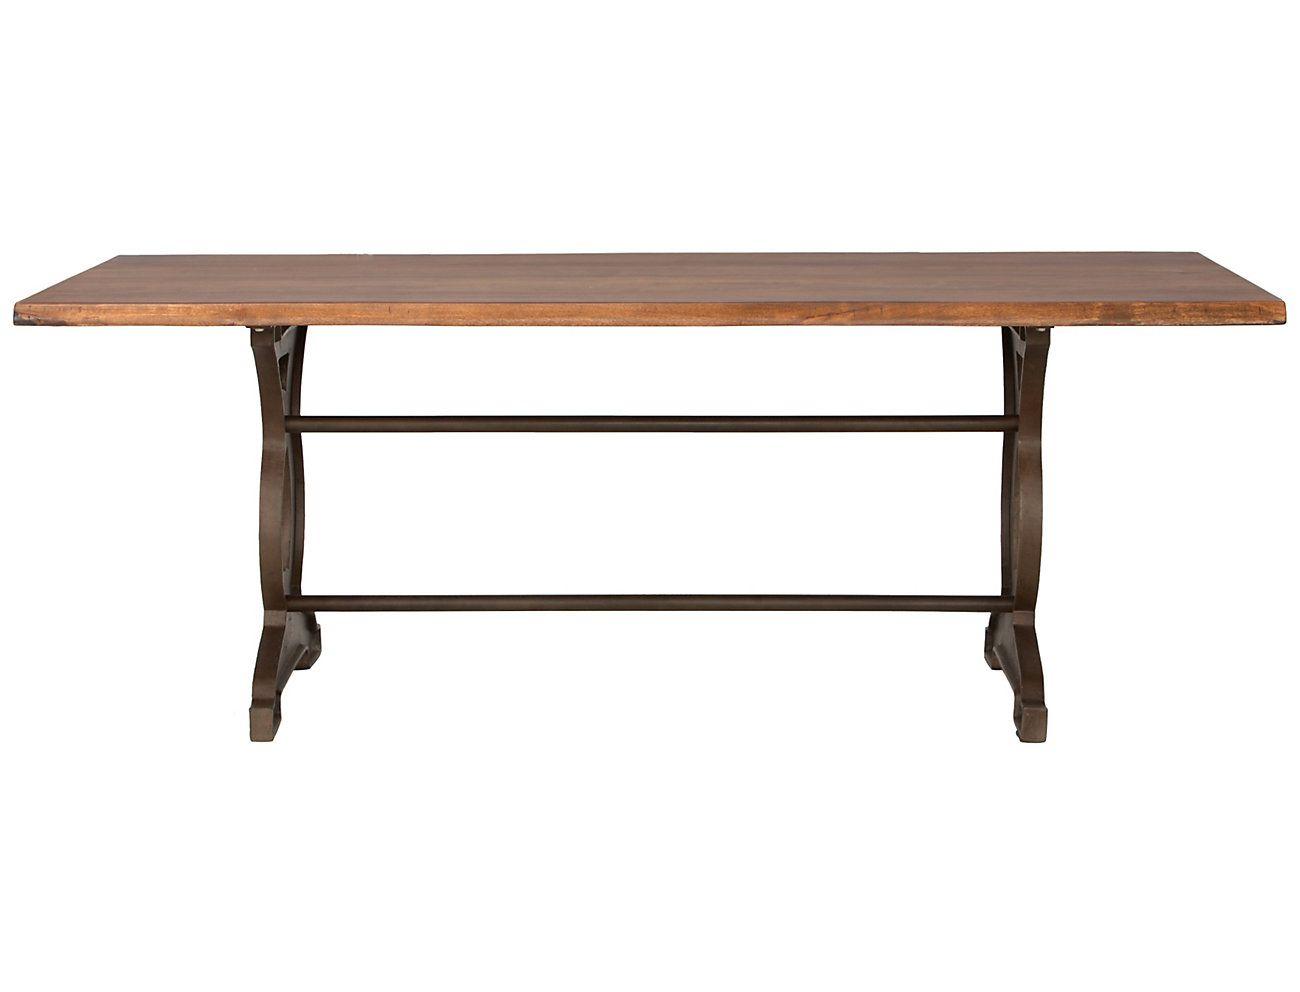 Art Van Furniture Natural Loft Dining Table Solid Acacia Wood